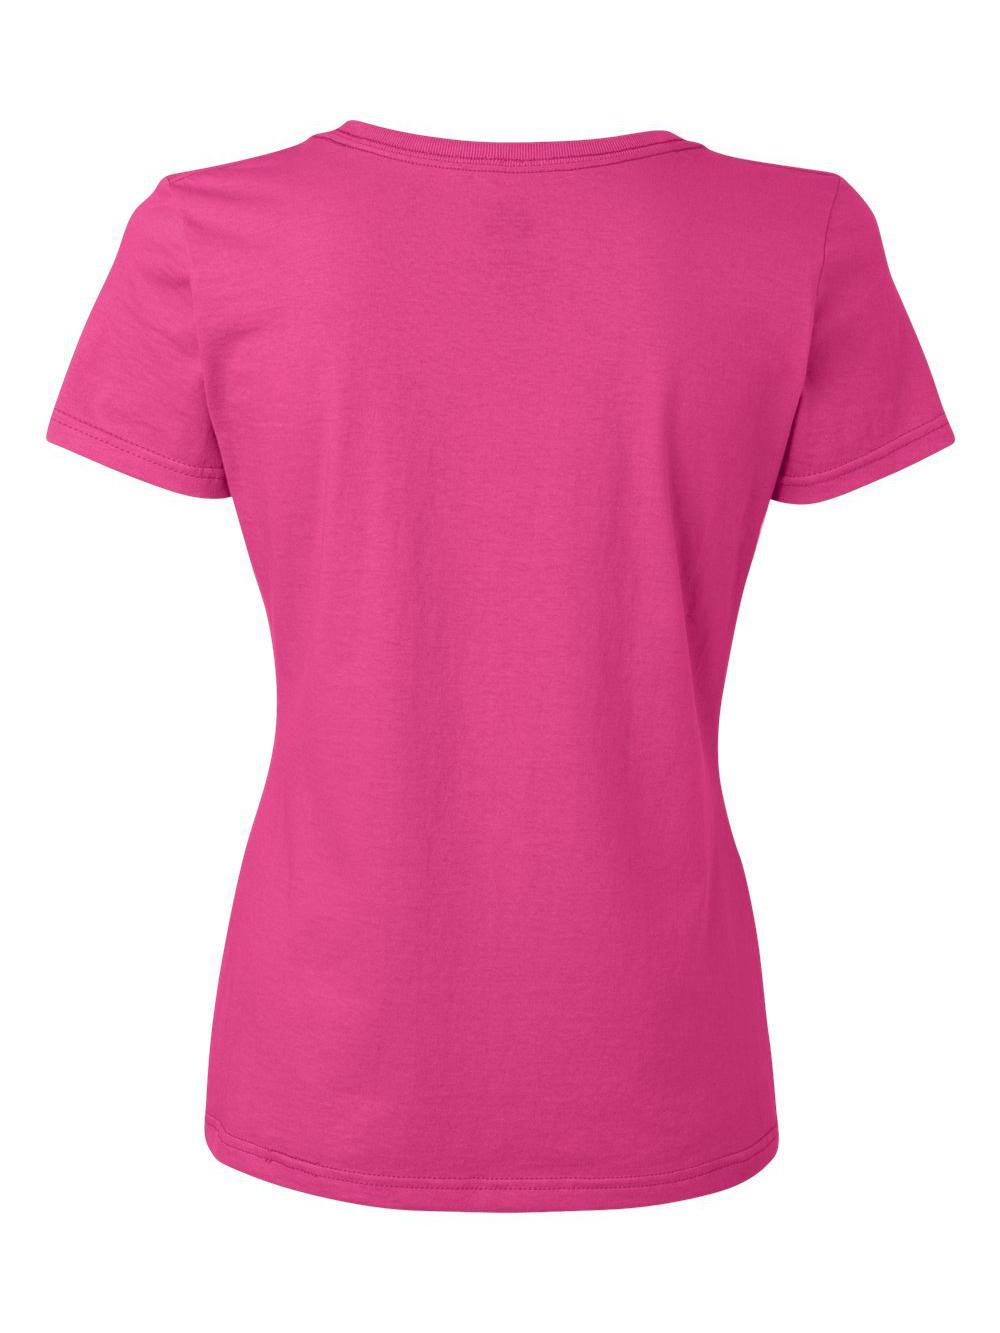 Fruit-of-the-Loom-HD-Cotton-Women-039-s-Short-Sleeve-T-Shirt-L3930R thumbnail 13